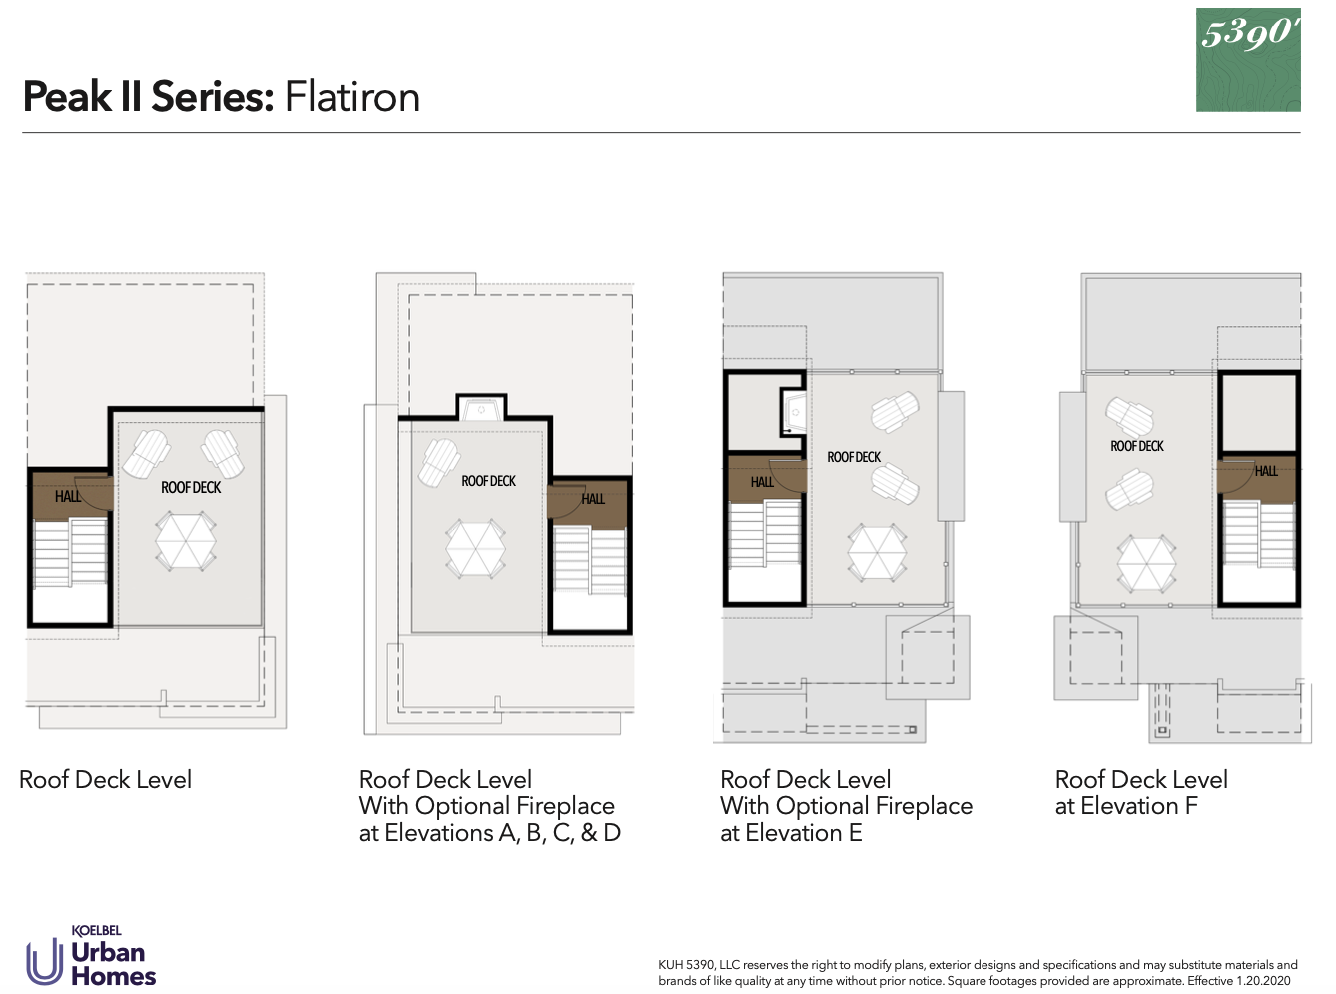 5390' Community by Koelbel in the Berkeley Tennyson Neighborhood Denver New Construction Homes For Sale Peak II Flatiron Floorplan2